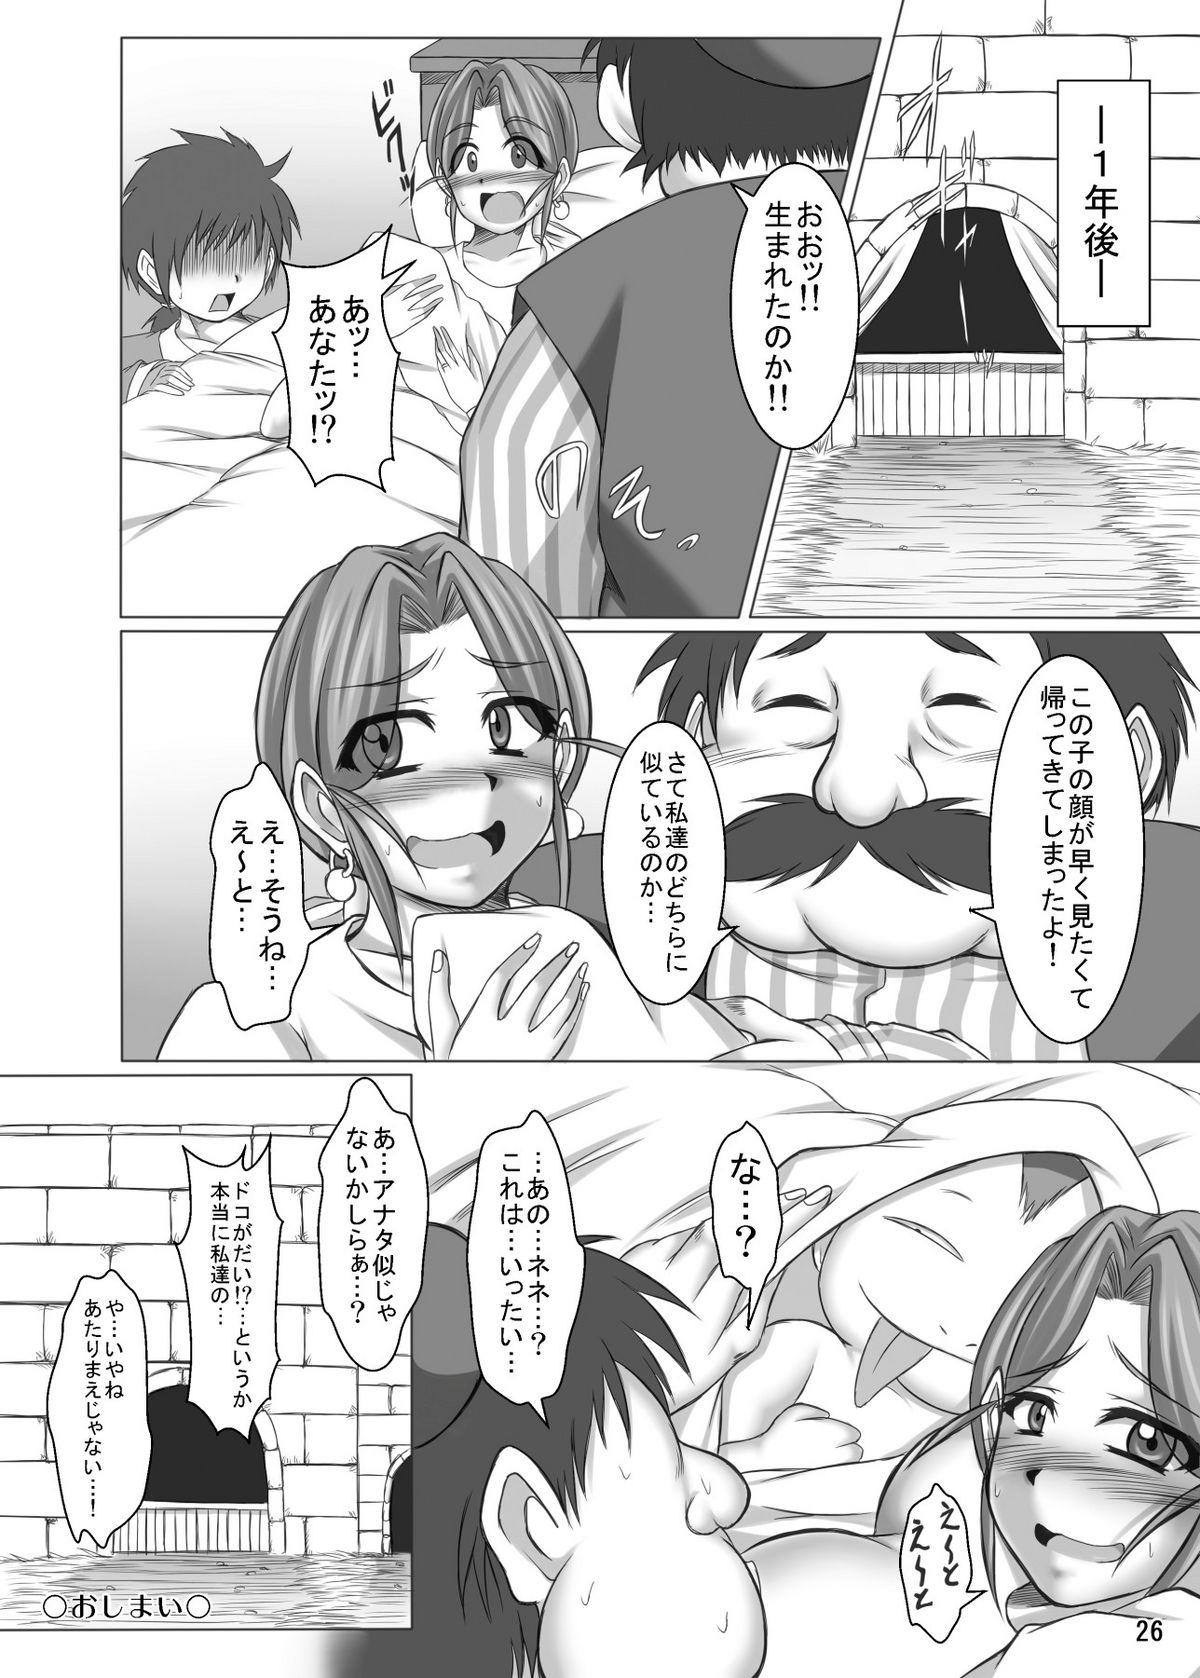 (COMIC1☆4) [Pint Size (Yakusho)] Toruneko Fujin Nene(36) Inran Bakunyu Mesuduma Manya Soe (Dragon Quest IV) 25